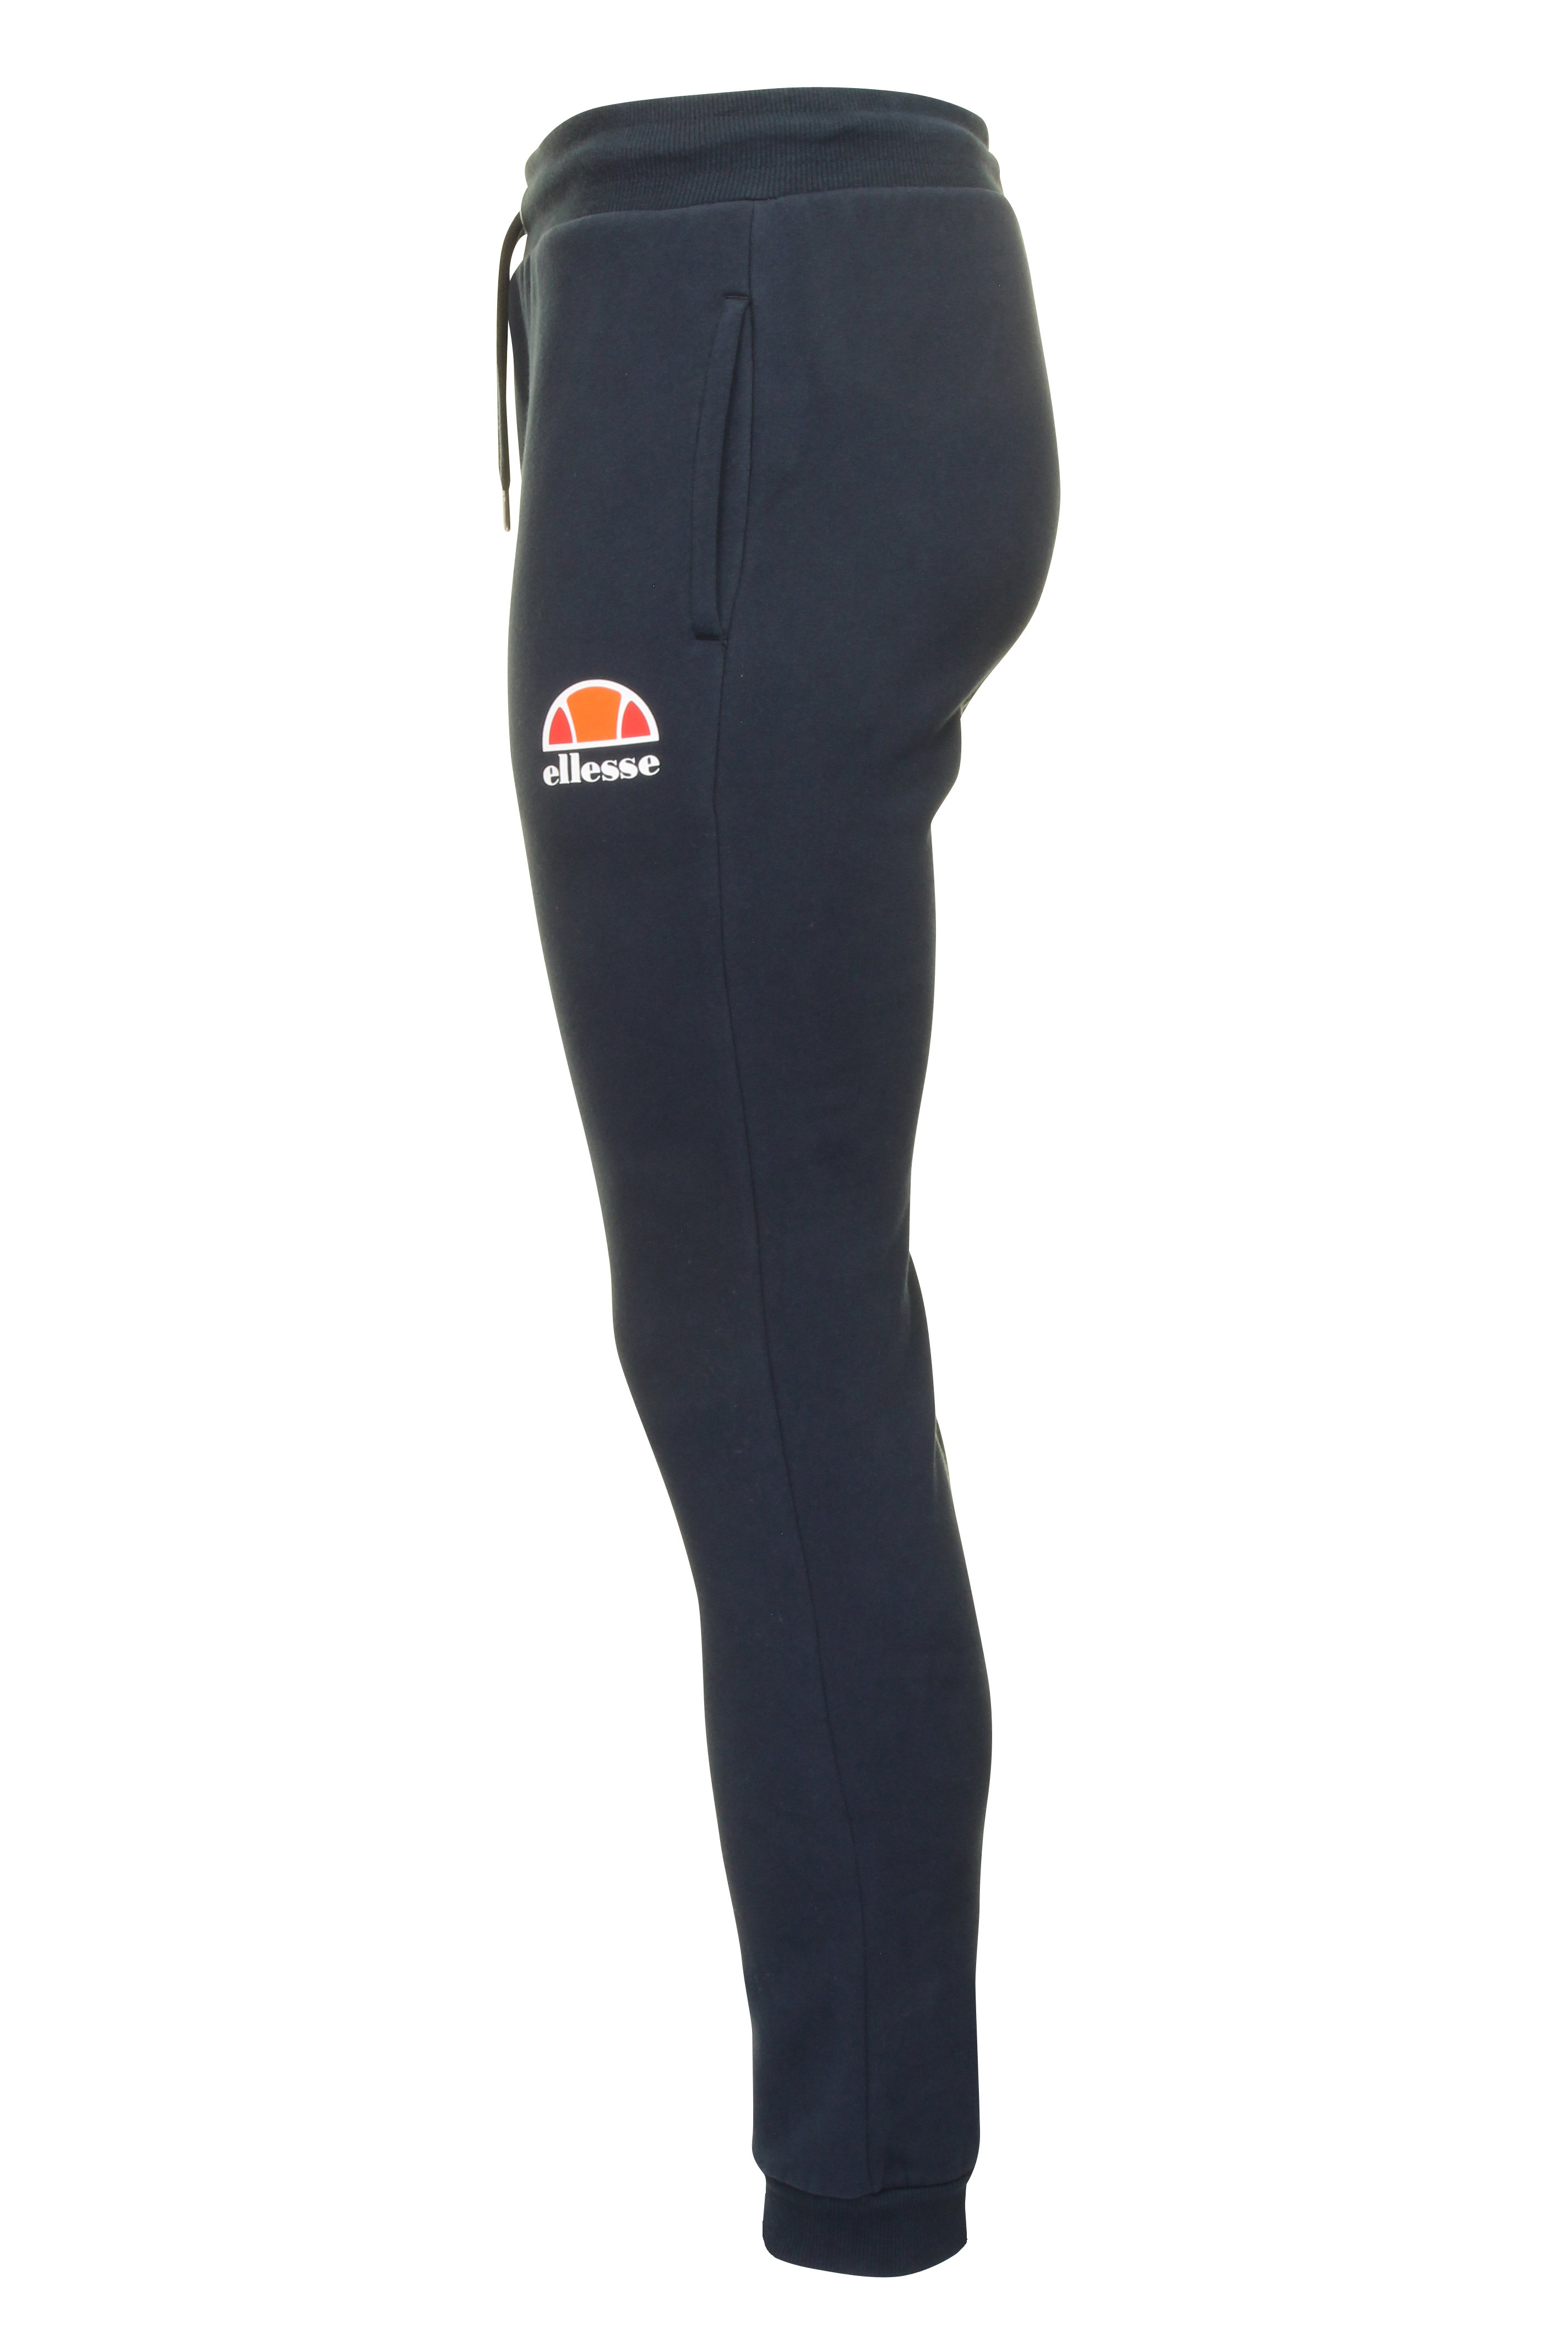 Ellesse-Da-Uomo-Pantaloni-Sportivi-Jog-Pantaloni-con-logo-034-Ovest-034 miniatura 13